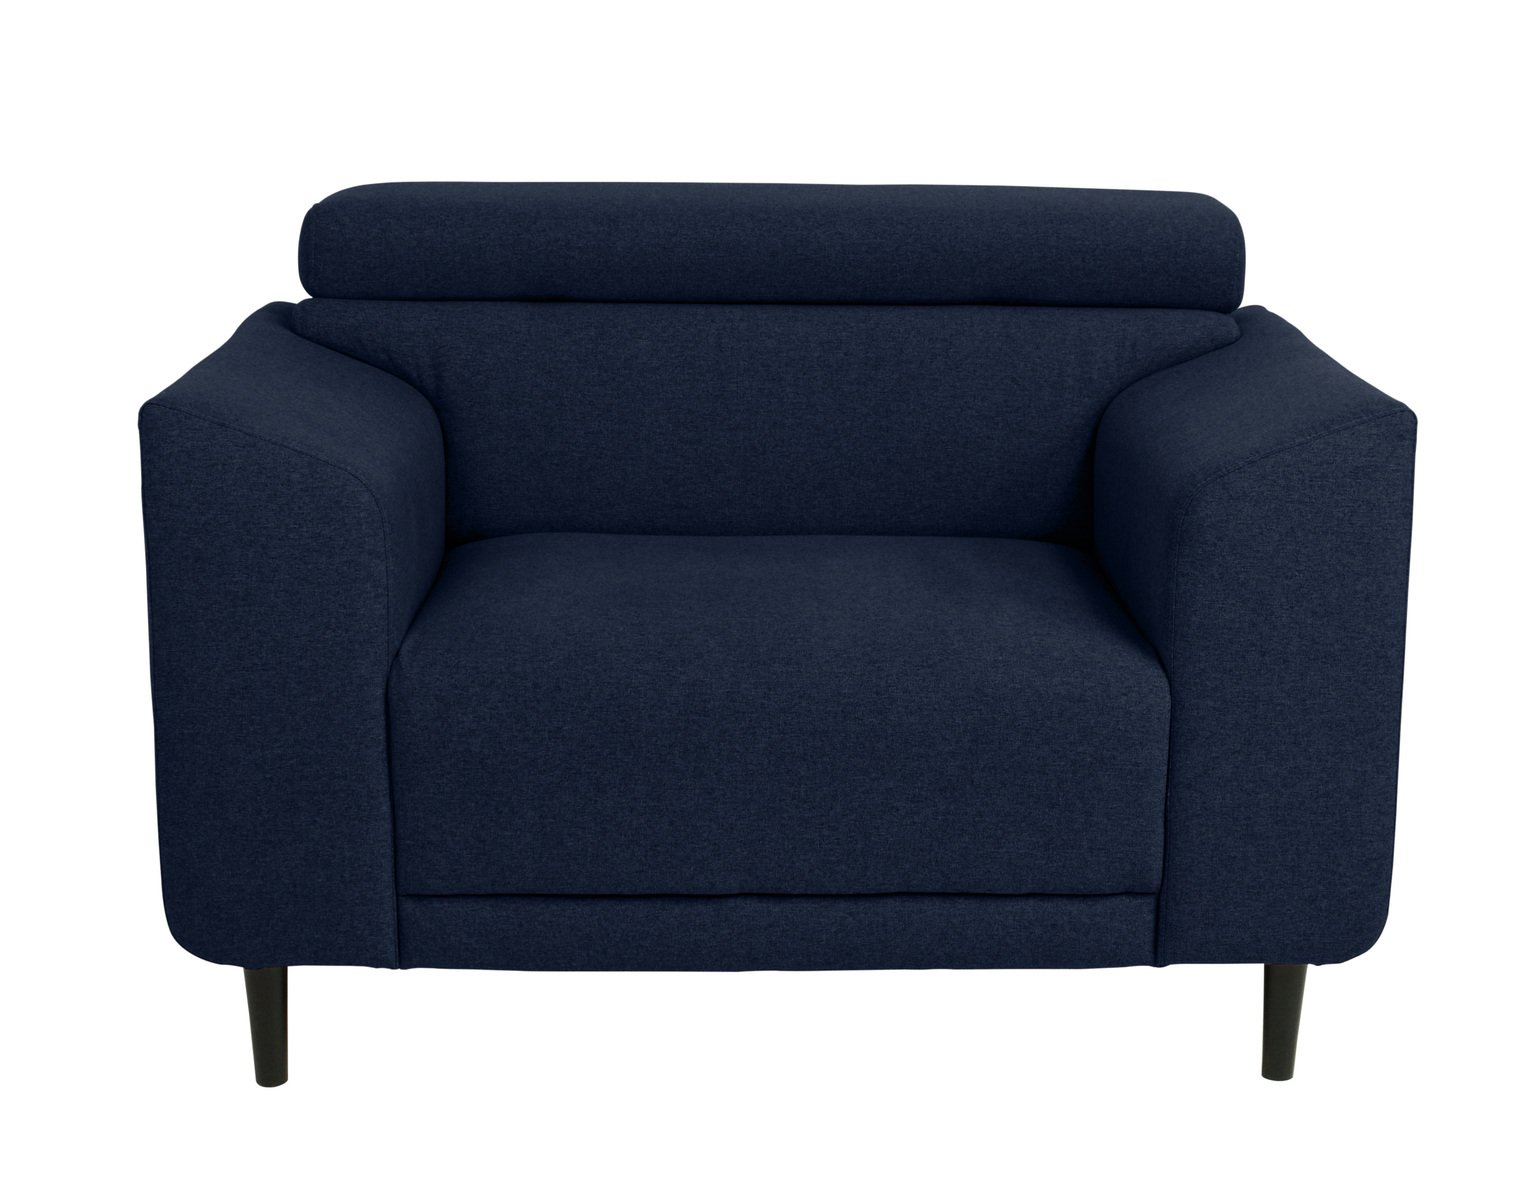 Argos Home Jonas Fabric Cuddle Chair - Navy